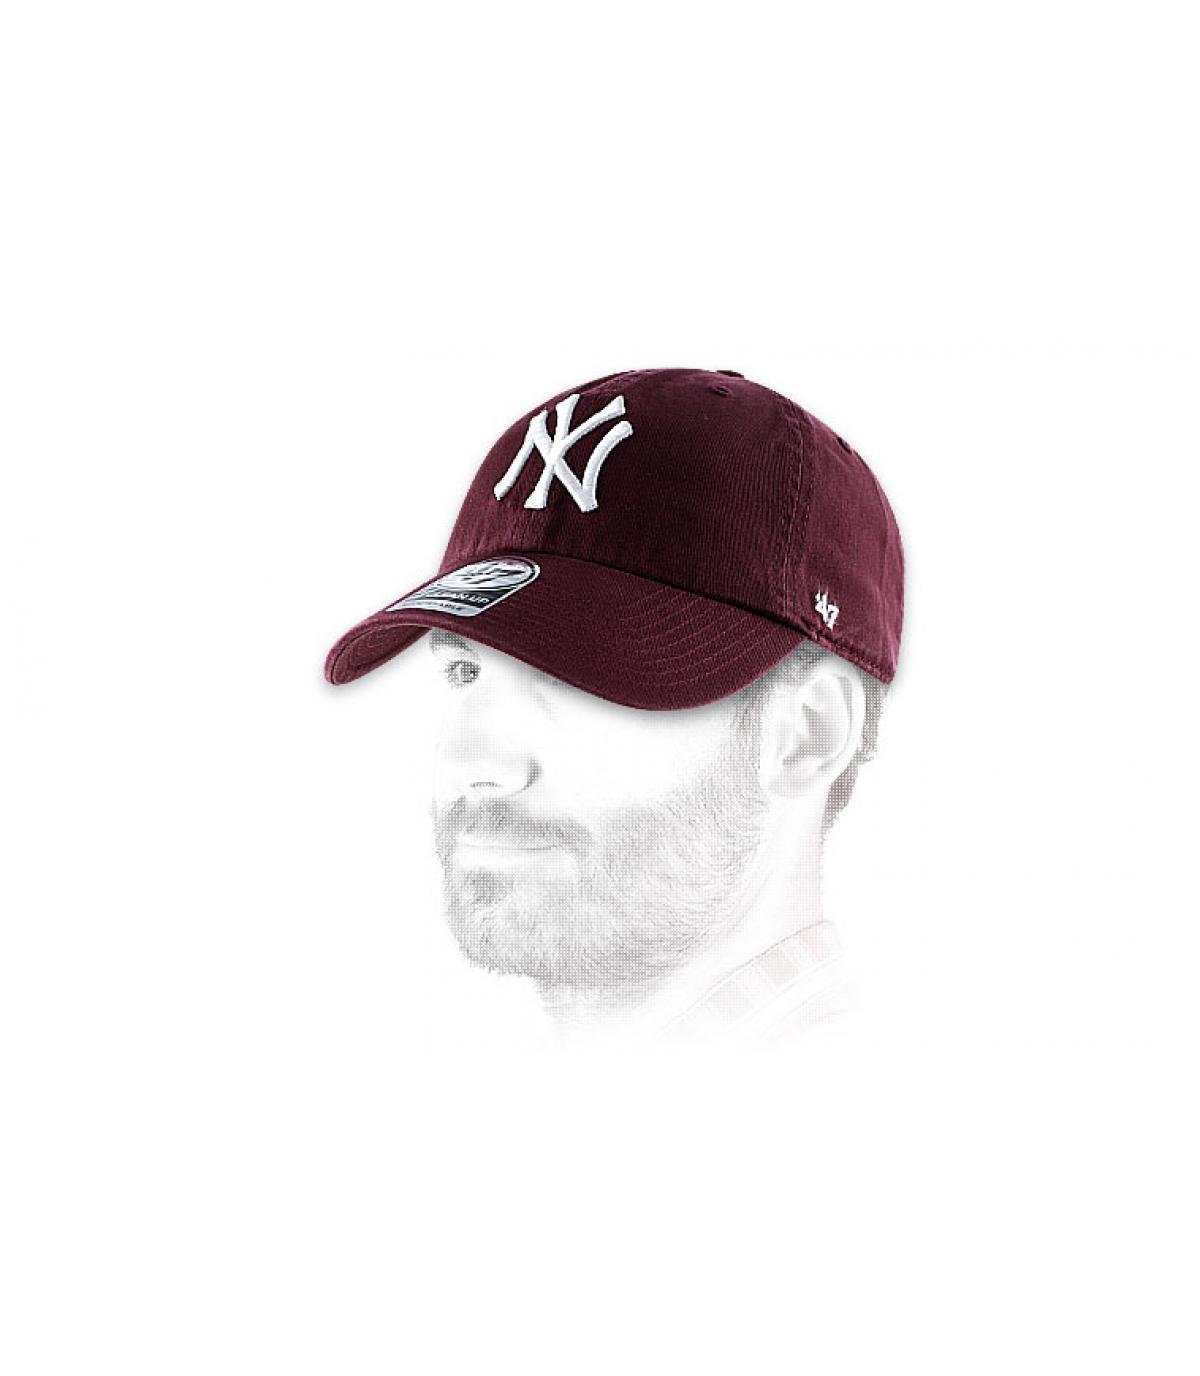 Burgundy NY curve cap